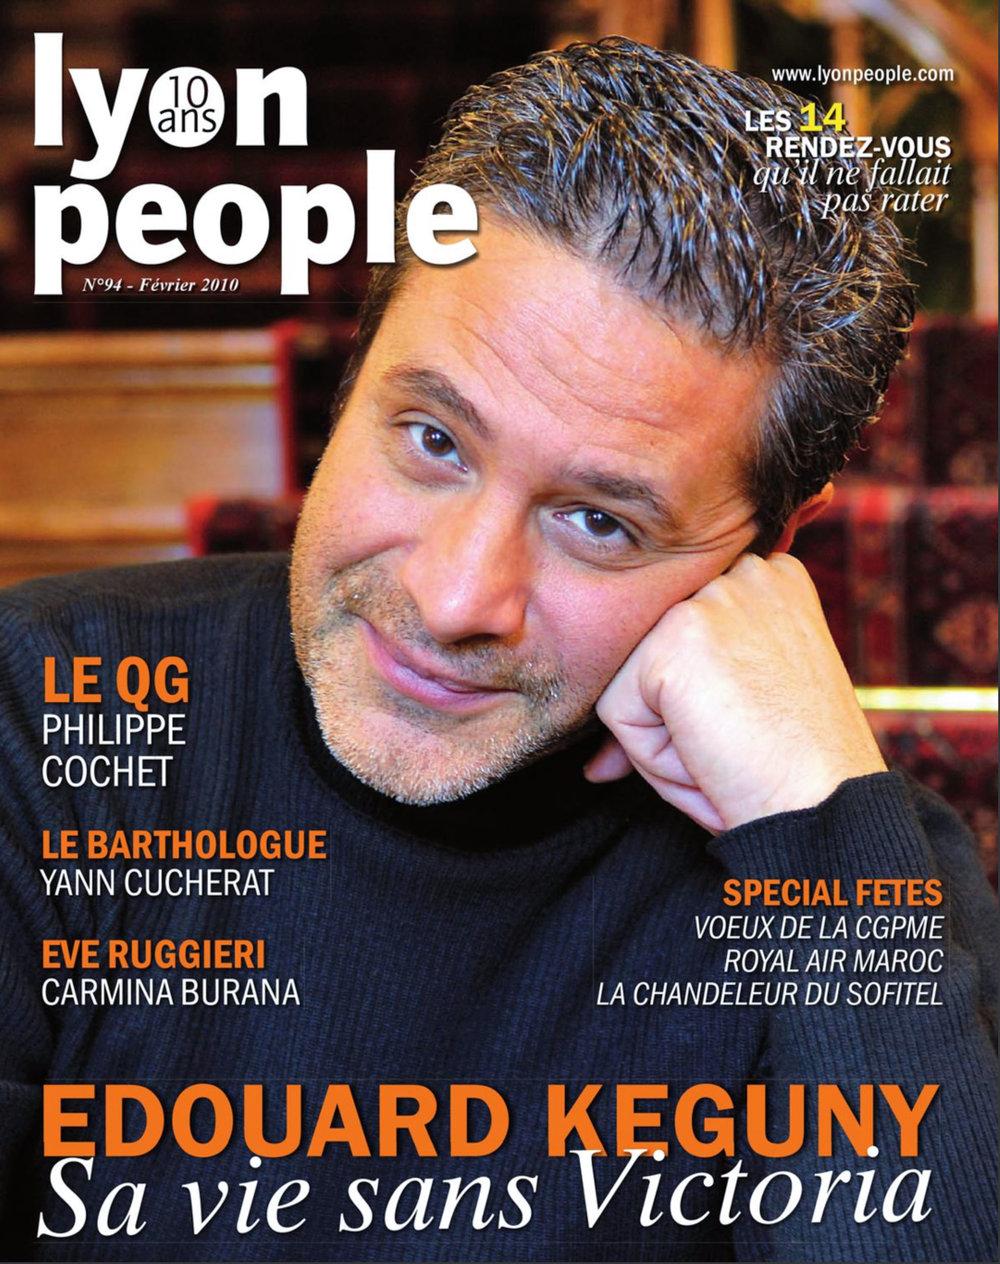 Couv Edouard Keguny.jpg